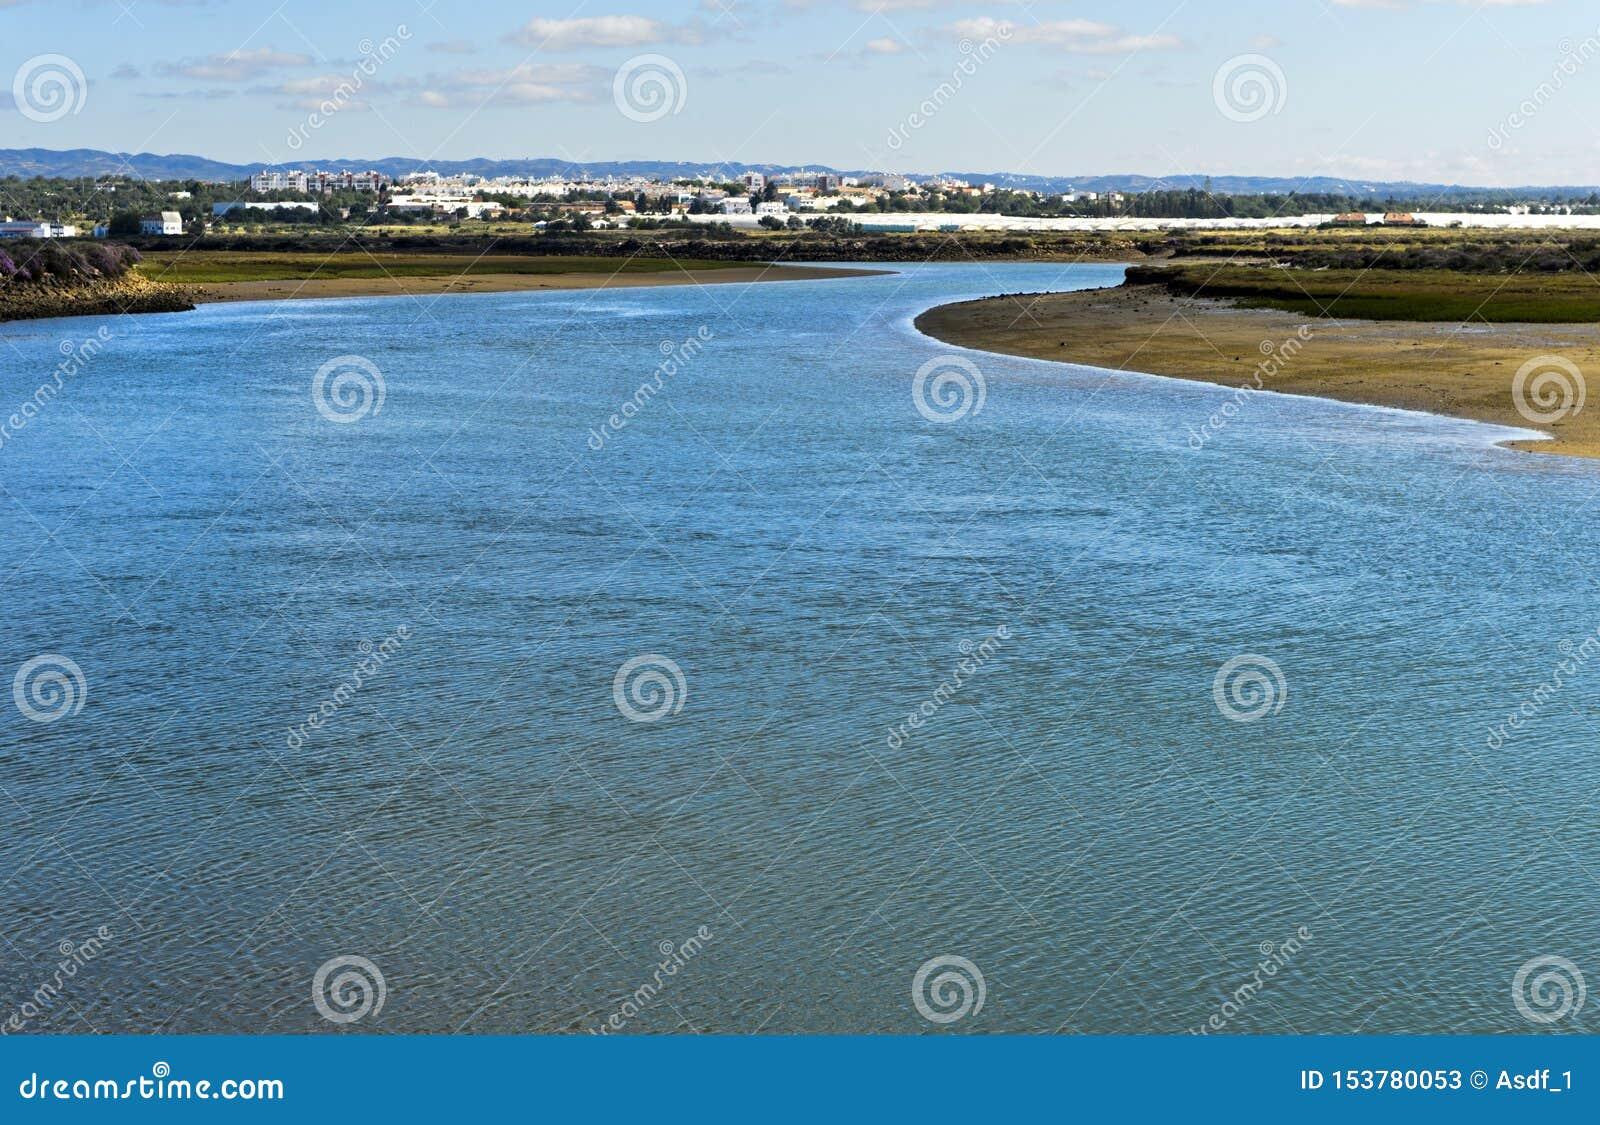 Rivière de Gilao, vue vers Tavira des Aguas de Quatro, Portugal